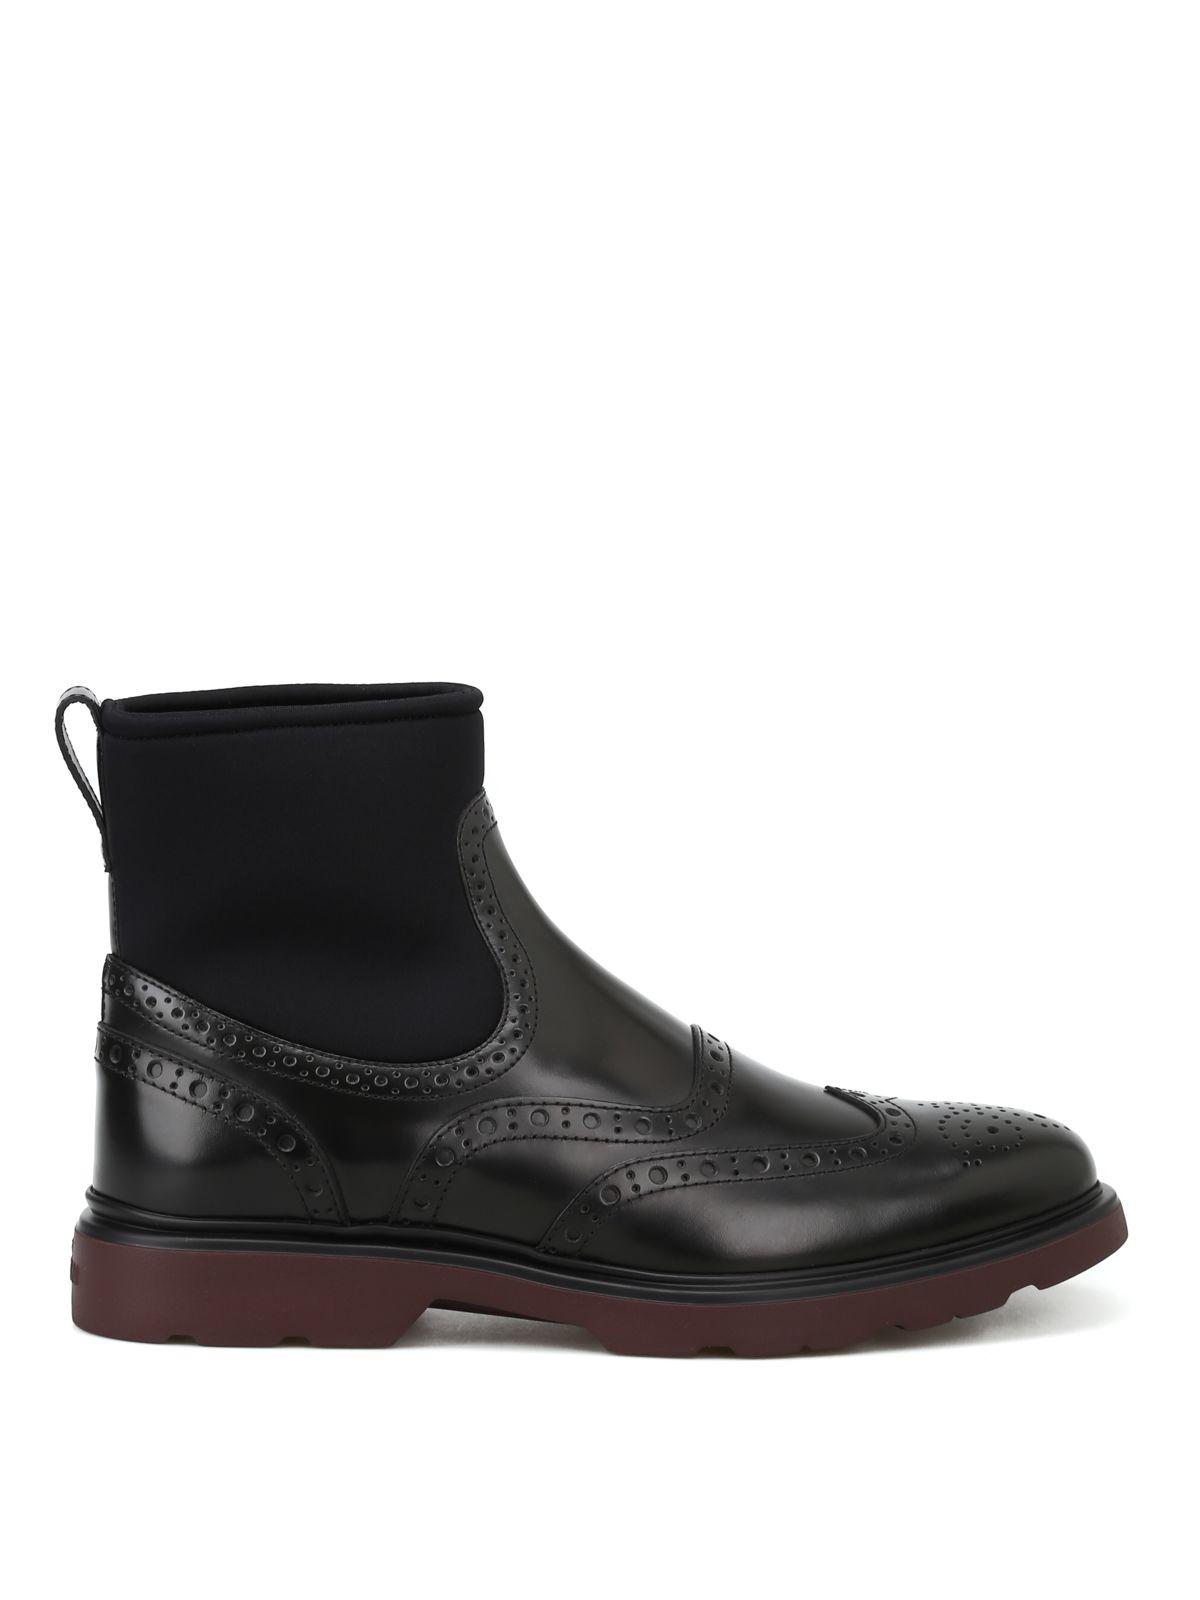 75d03f088d Hogan Hogan Ankle Boots - H304 - Black - 10743272   italist